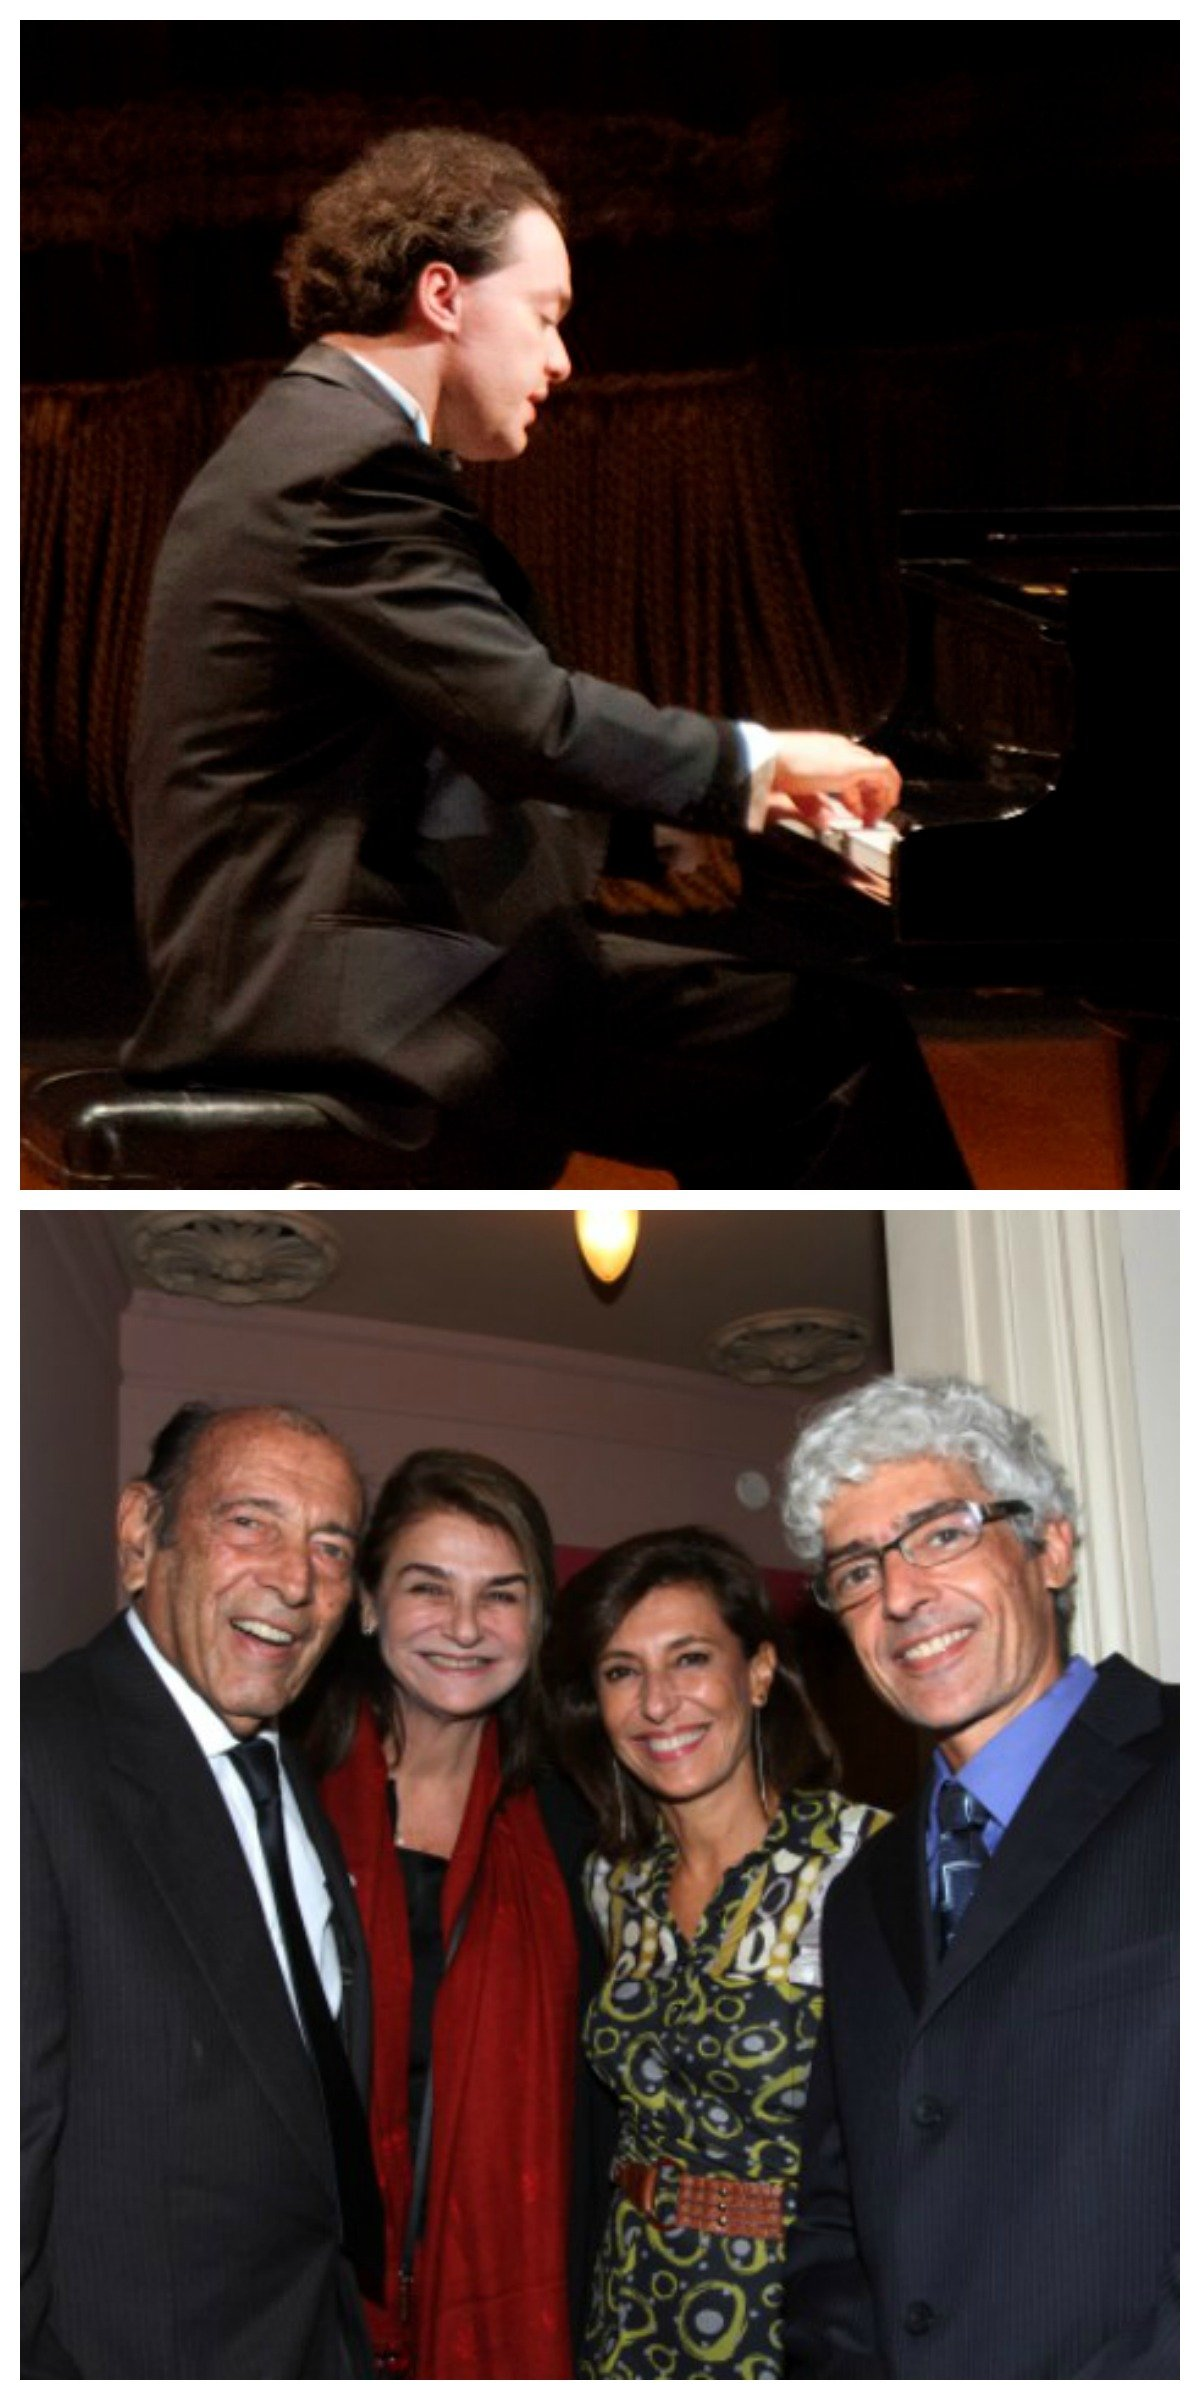 No alto, o pianista russo Evgeny Kissin; acima,  Israel e Léa Klabin, Maria Sílvia Bastos Marques e Steffen Dauelsberg/ Fotos: Eny Miranda/Cia da Foto